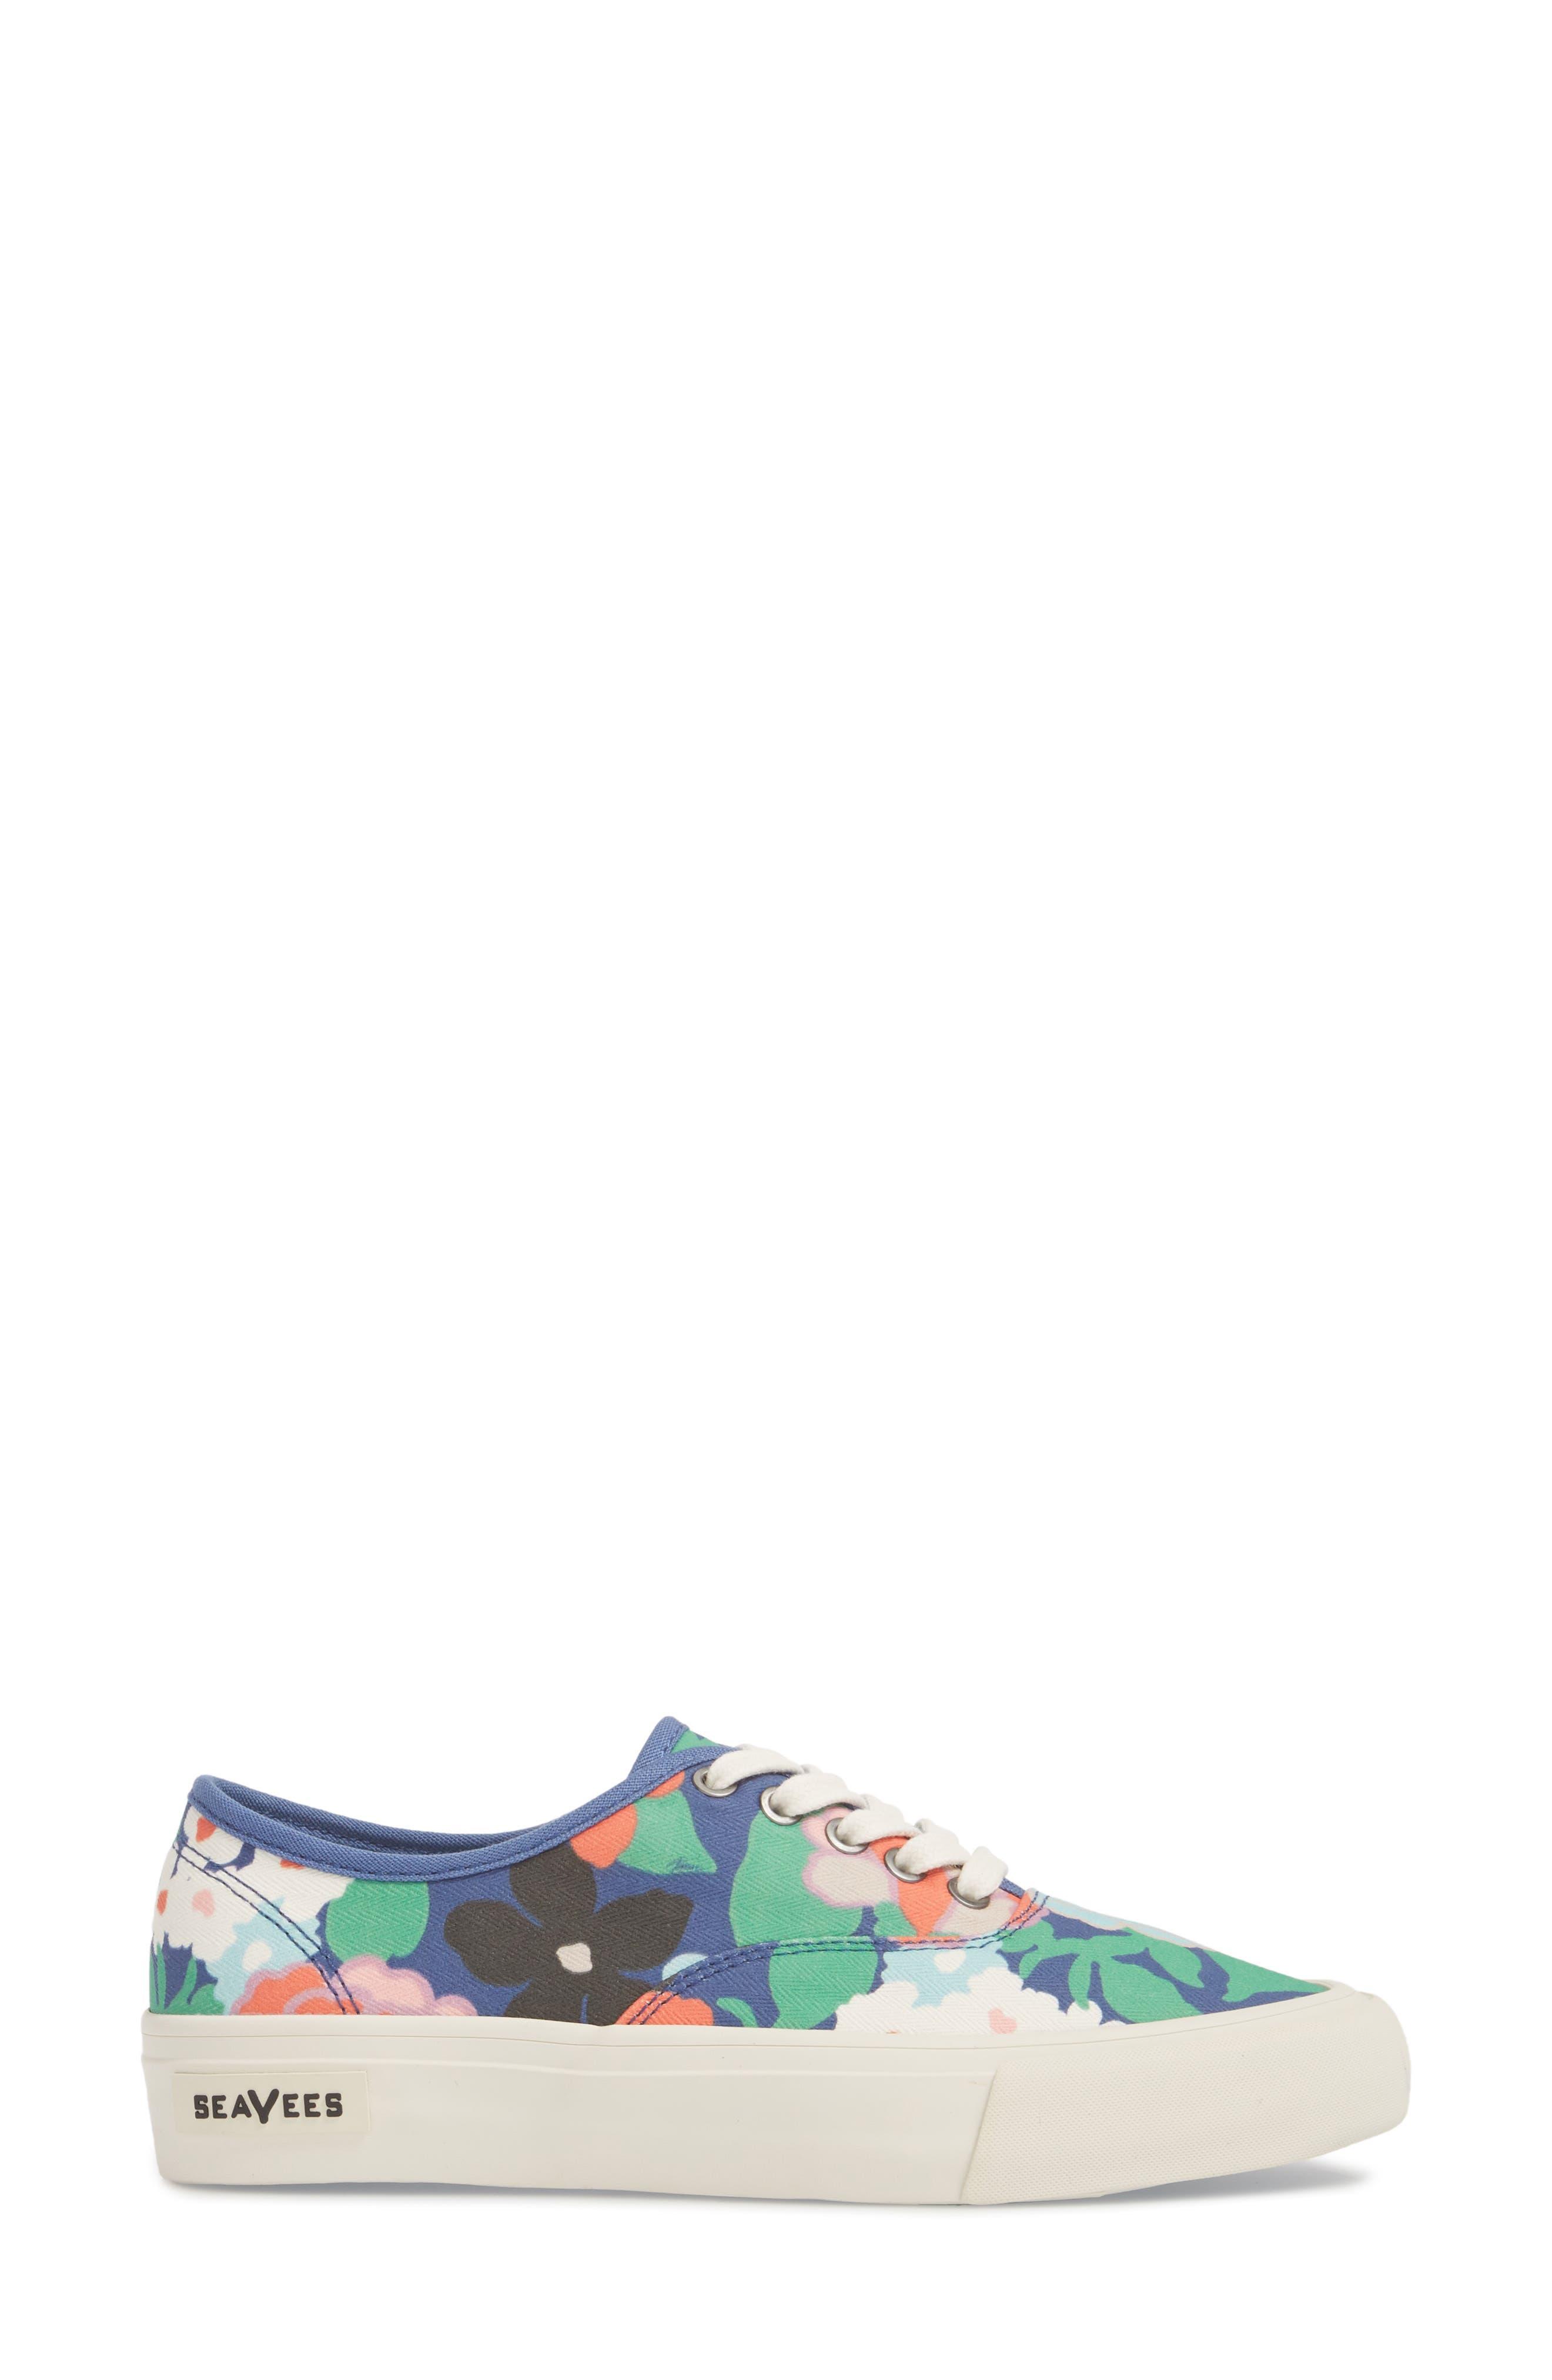 x Trina Turk Legend Sneaker,                             Alternate thumbnail 3, color,                             Greenhouse Floral